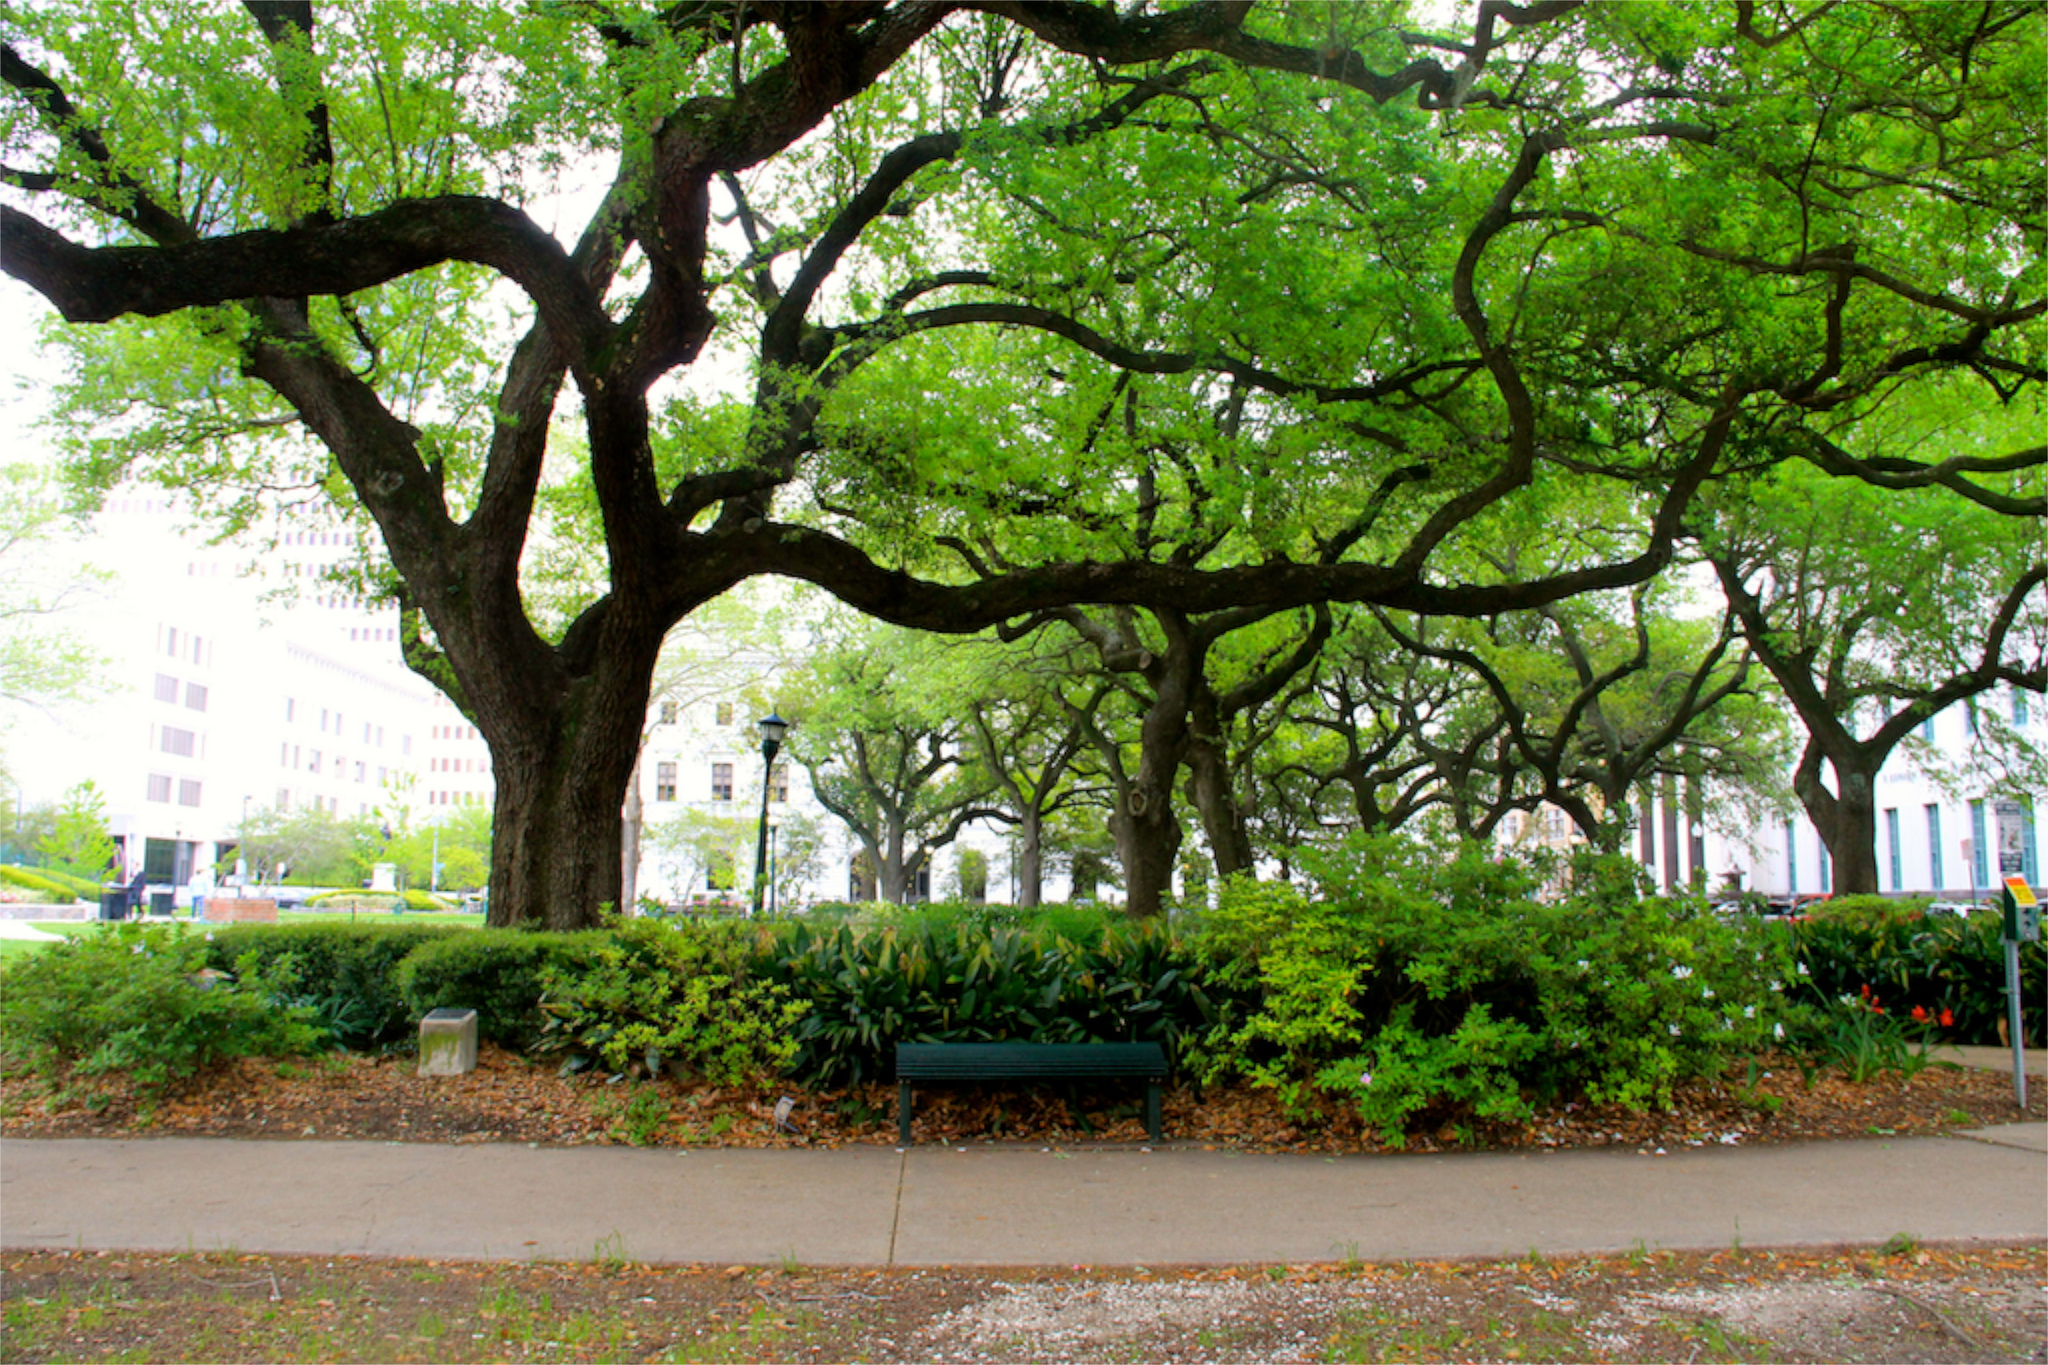 Tree on St. Charles Street in New Orleans, LA